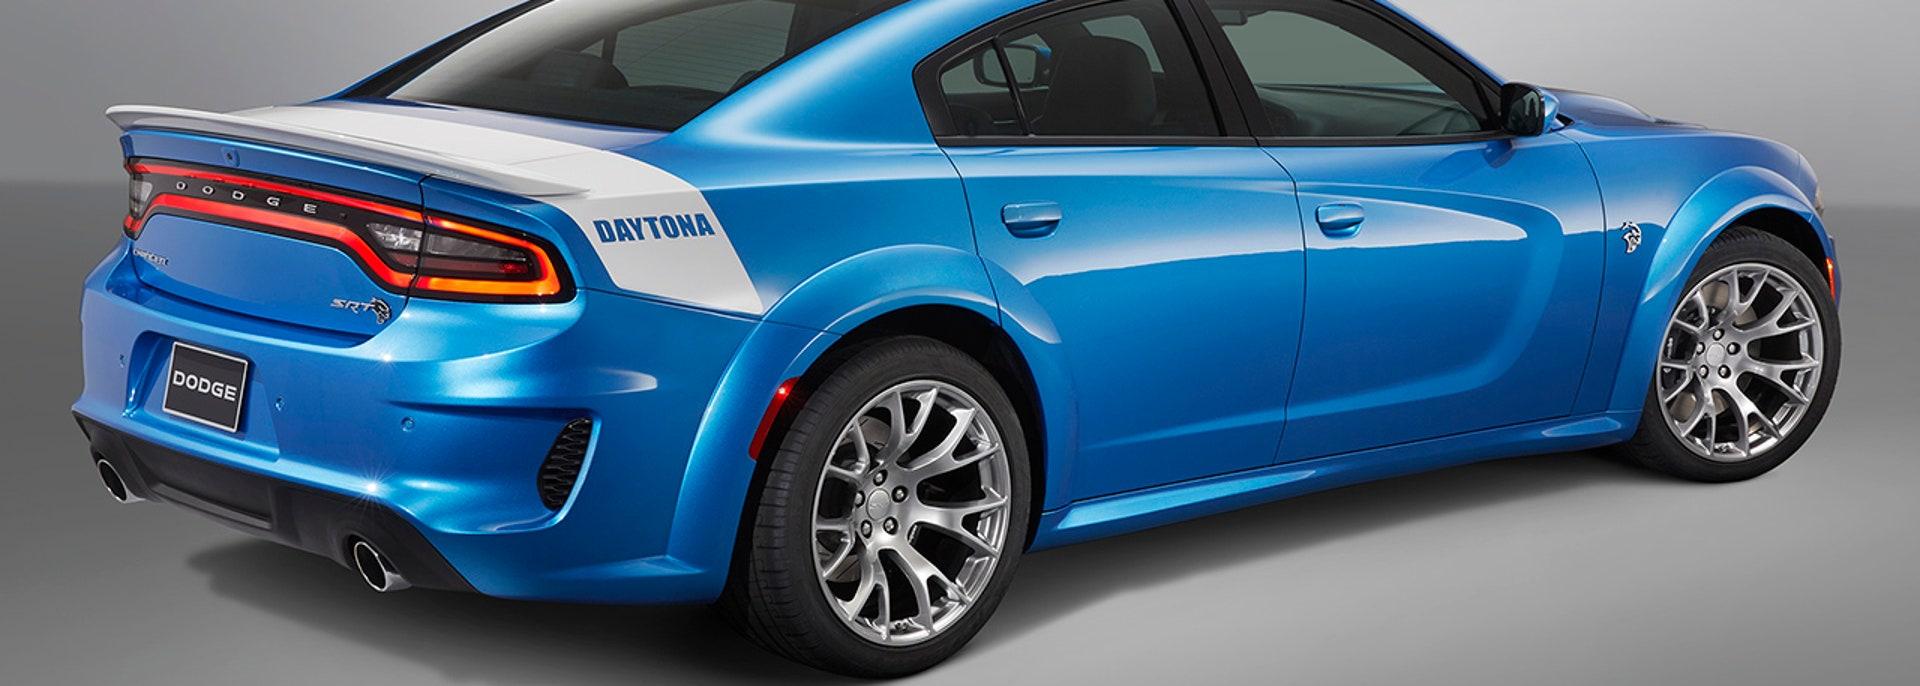 The 2020 Dodge Charger Srt Hellcat Widebody Daytona 50th